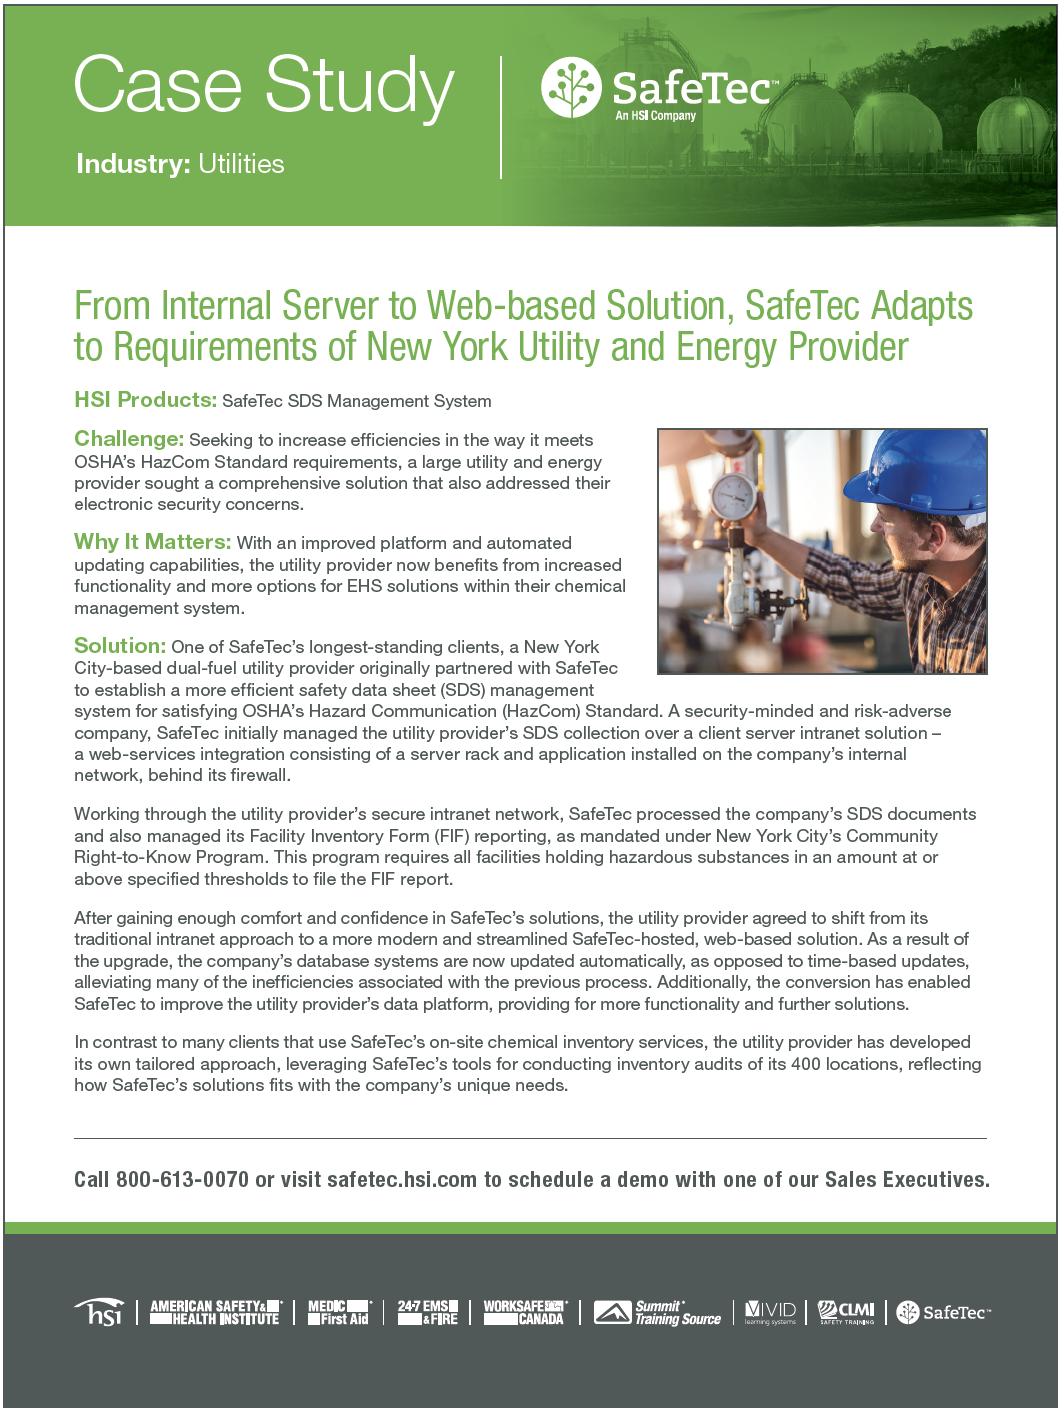 New York Utilities Provider SDS Management Case Study